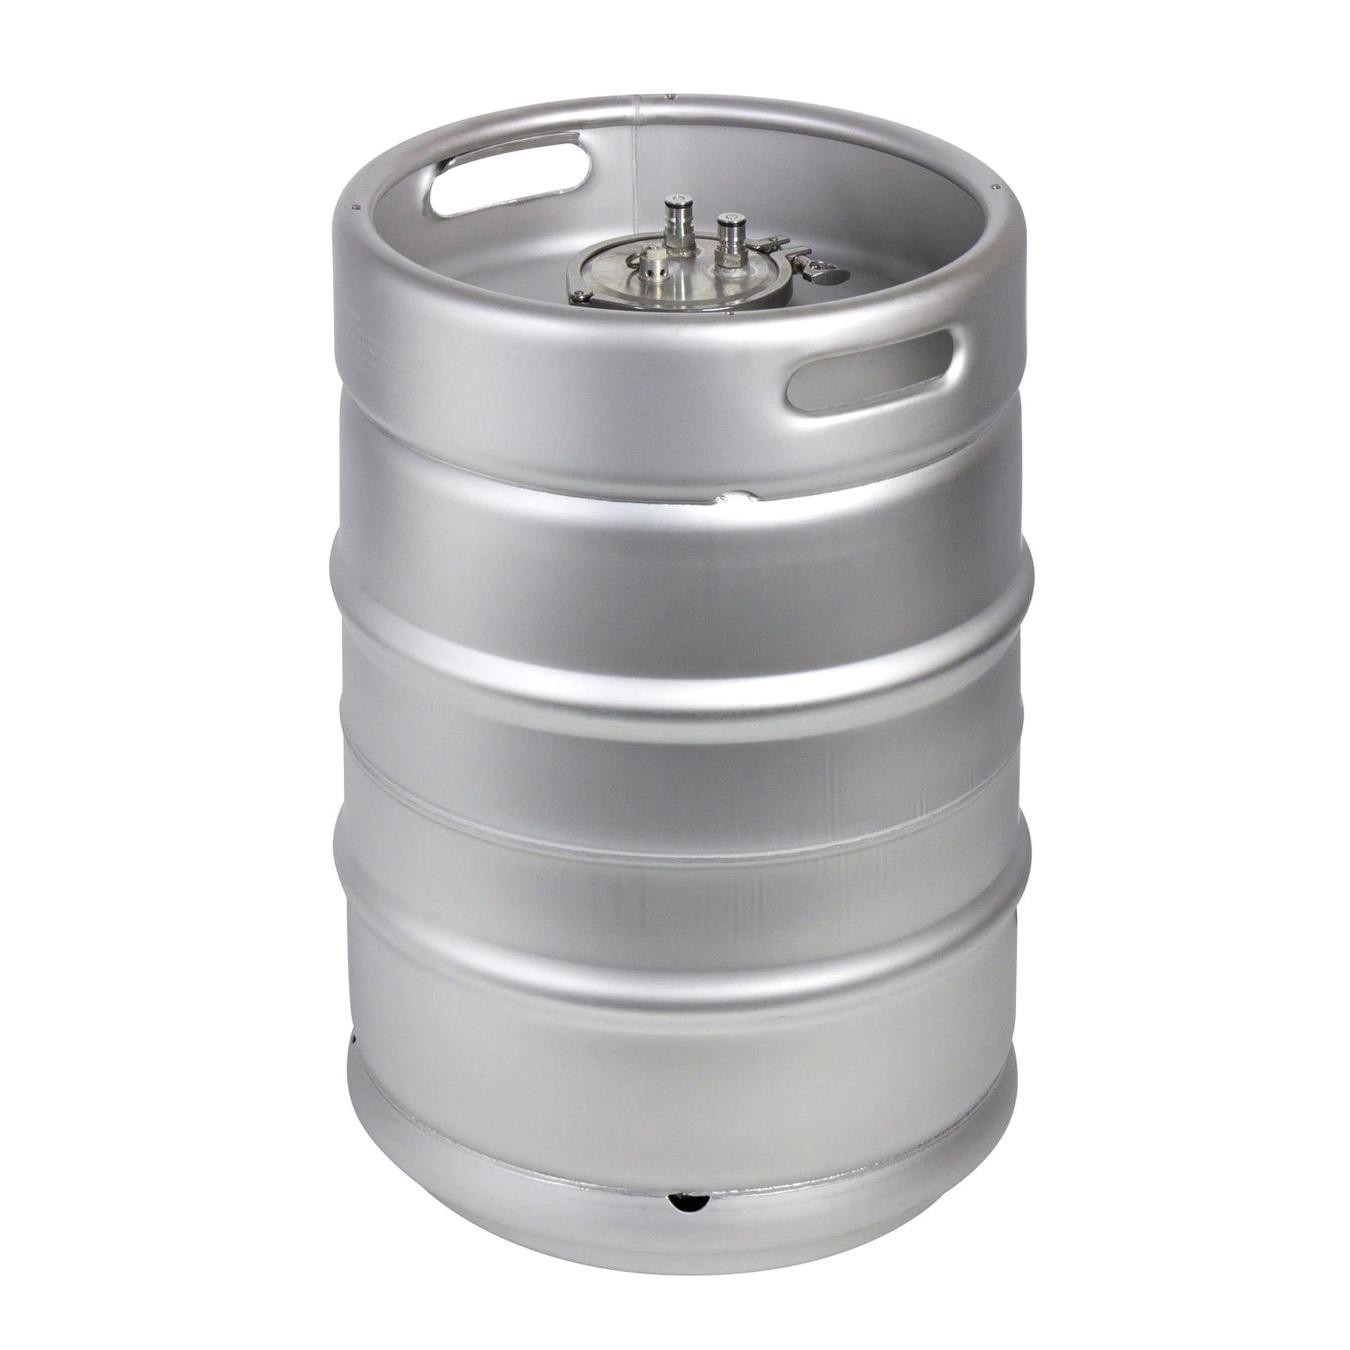 Bells Oberon Beer Keg